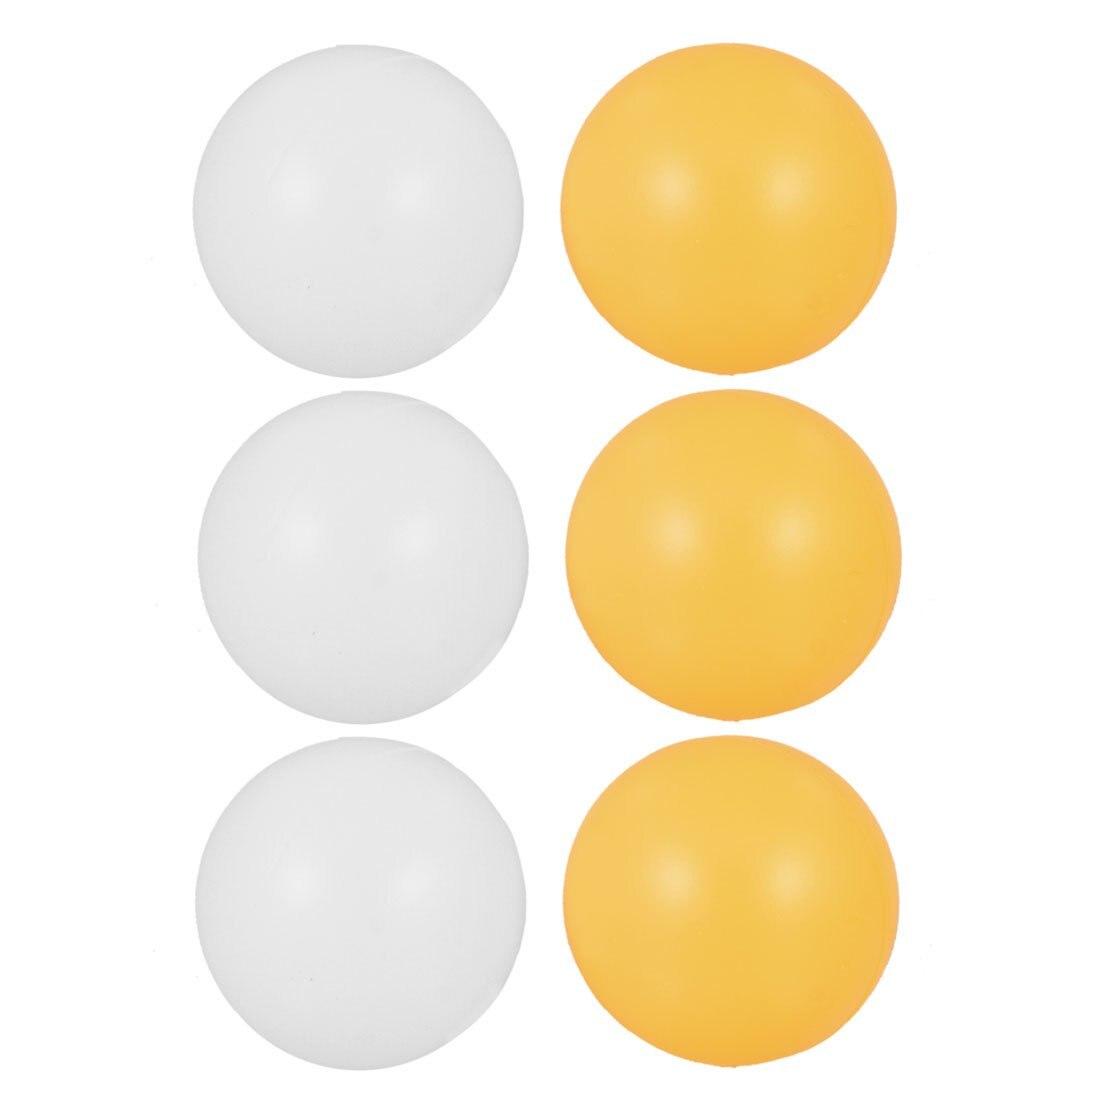 SZ-LGFM-White Orange 39mm Dia Sports Table Tennis Balls Ping Pong Ball 6 Pcs